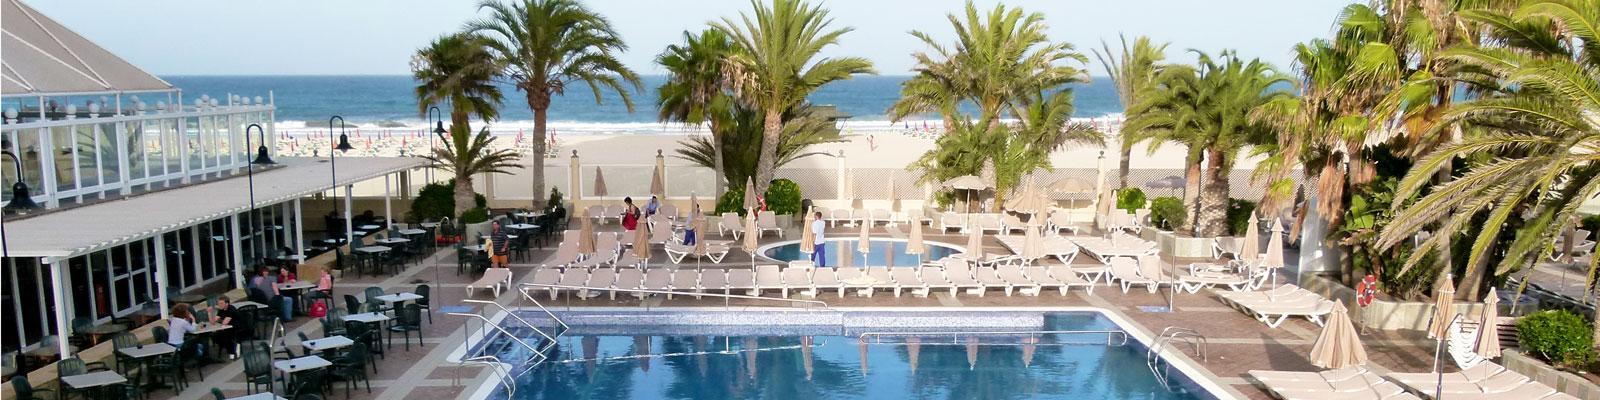 Riu Oliva Beach Hotel - Corralejo Fuerteventura